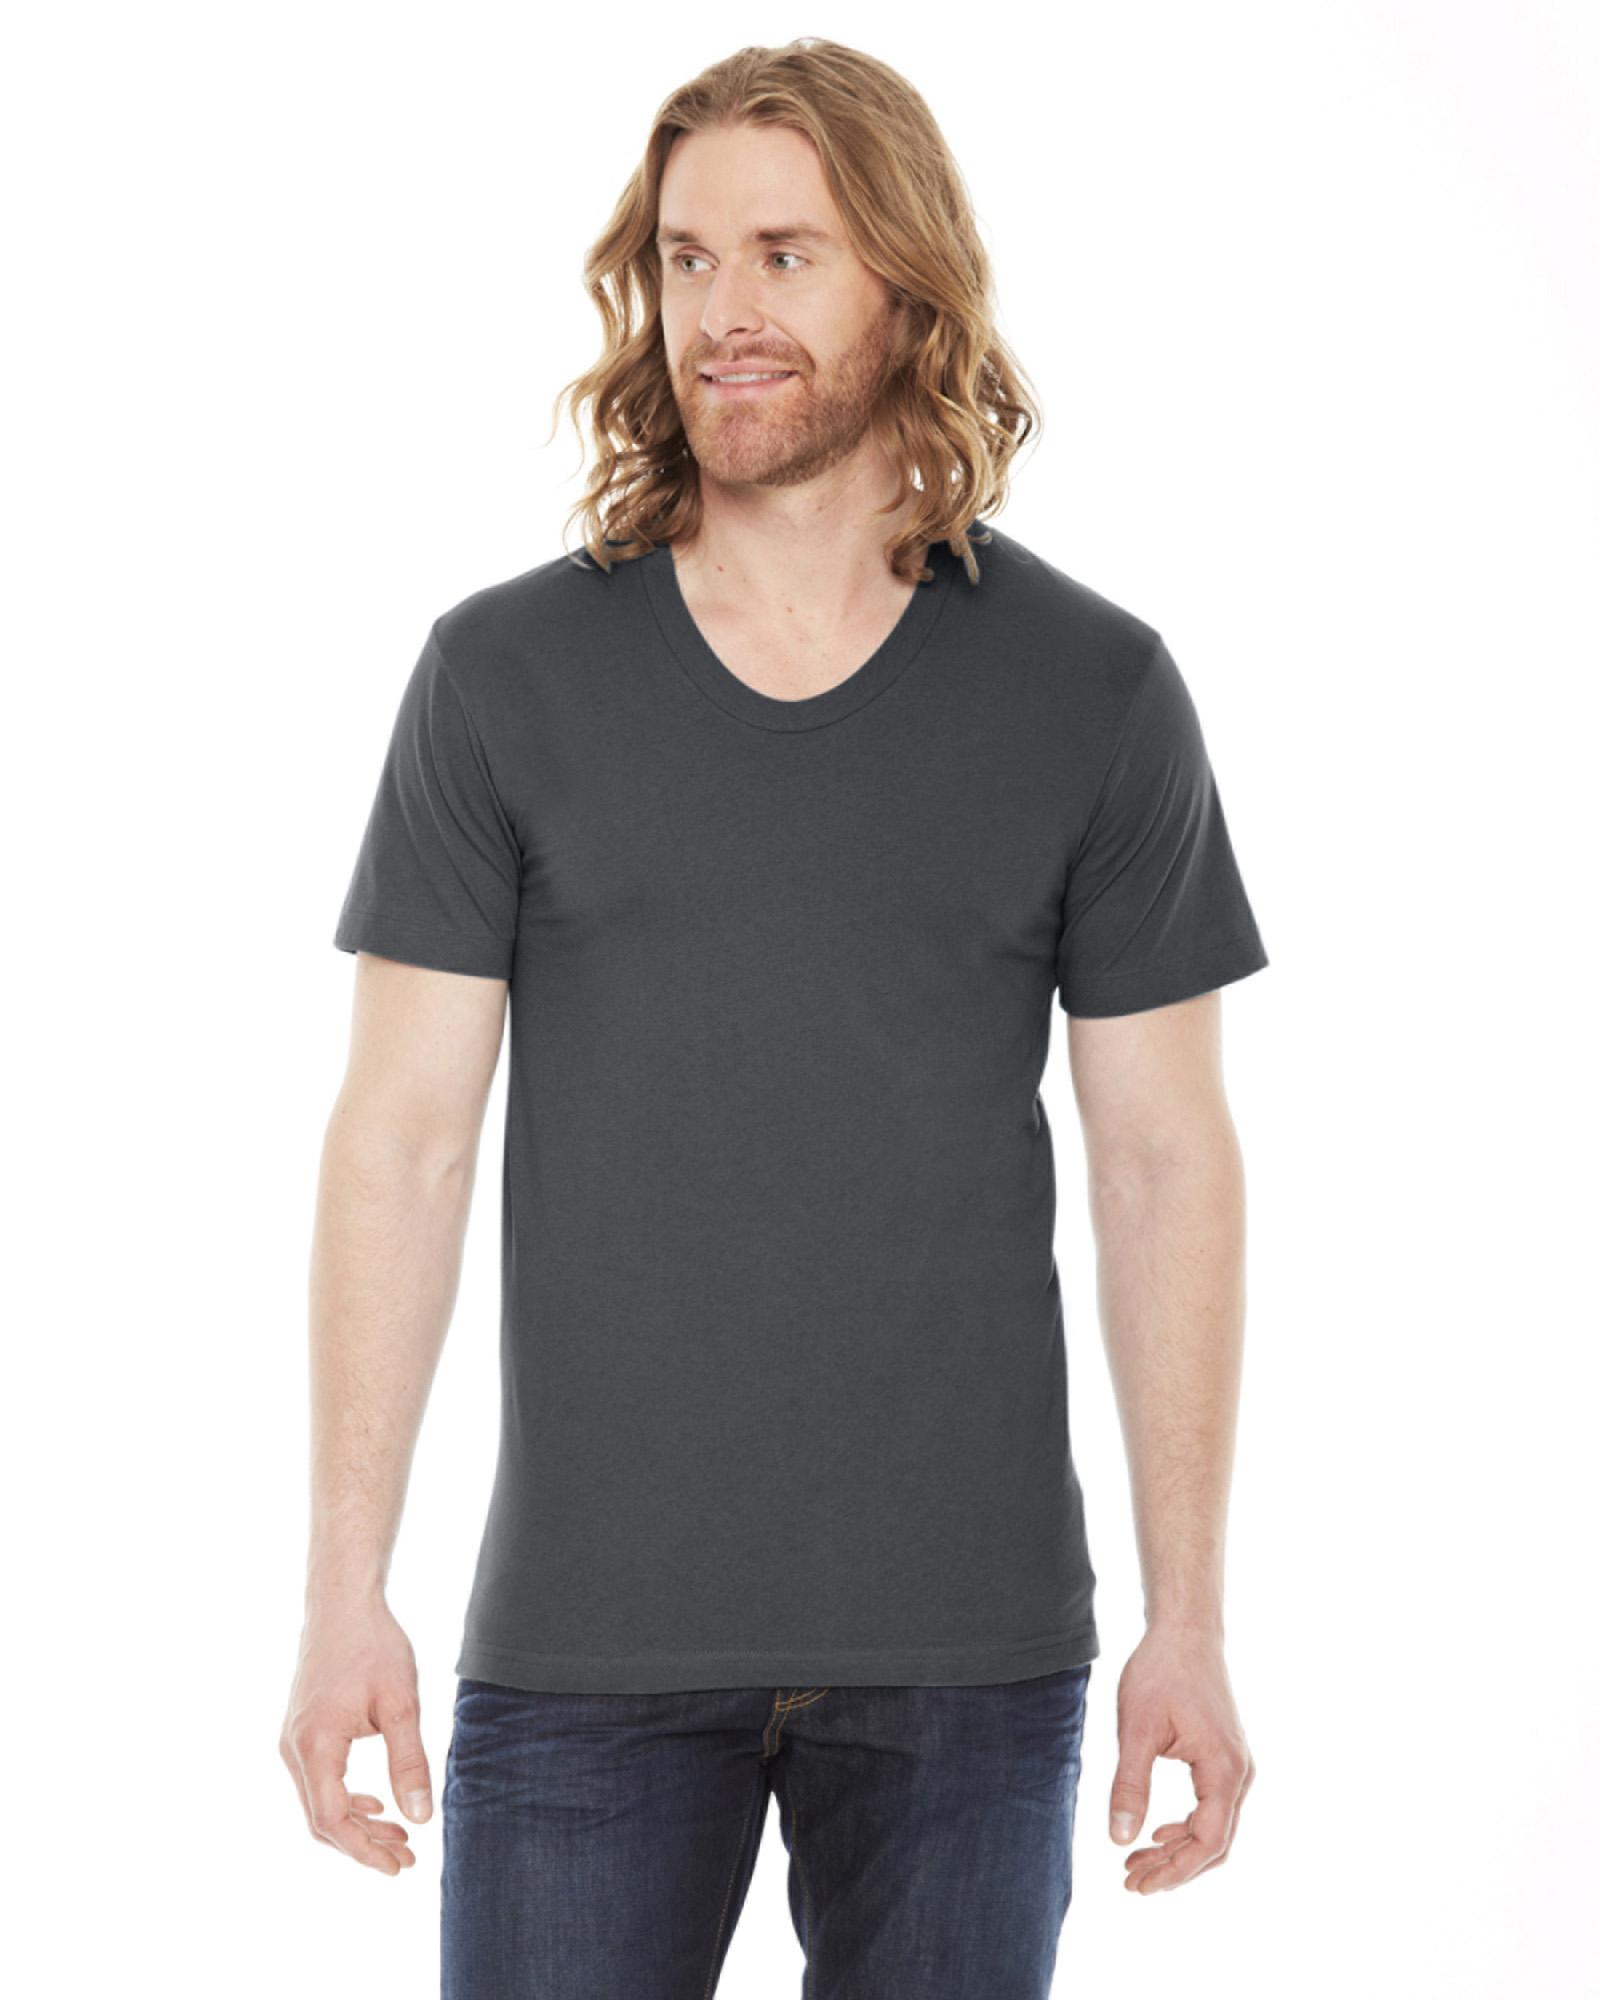 American apparel rsa6402 unisex sheer jersey loose crew for American apparel custom t shirt printing